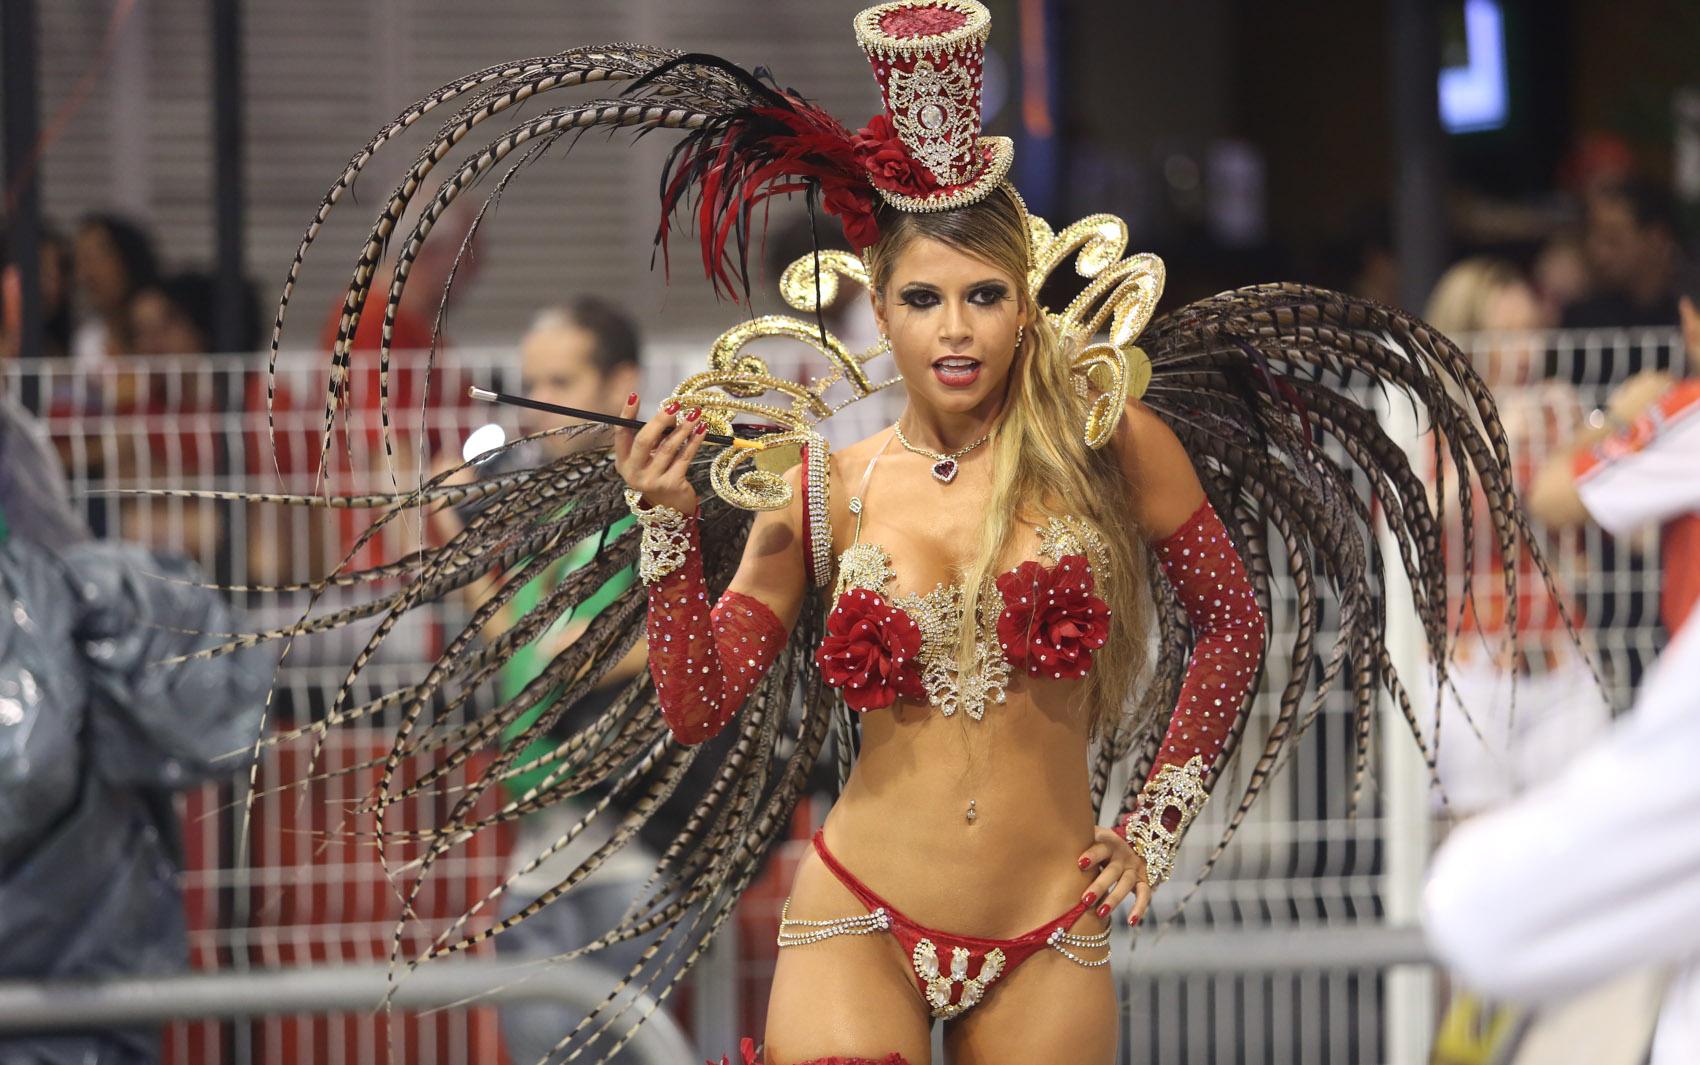 A ex-BBB Cacau Colucci exibe a fantasia durante desfile da Dragões da Real